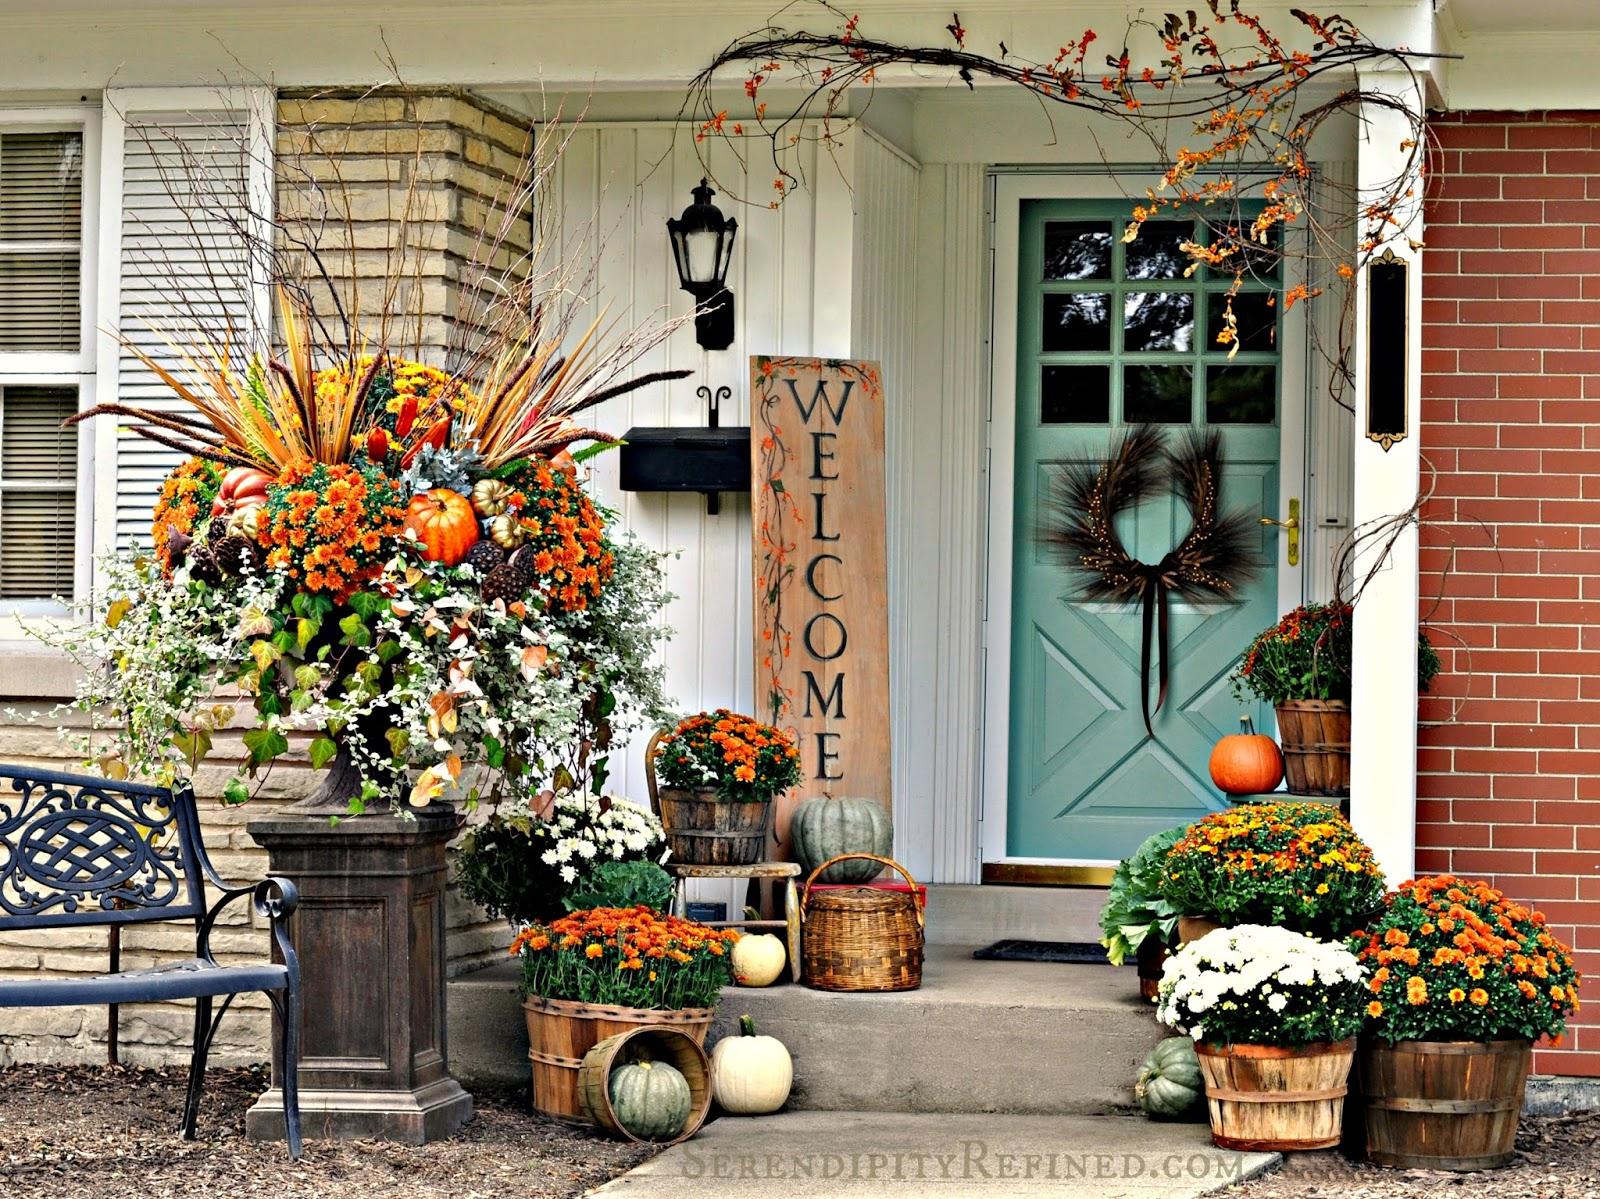 Serendipity refined blog fall harvest porch decor with for Idea deco guijarro exterior